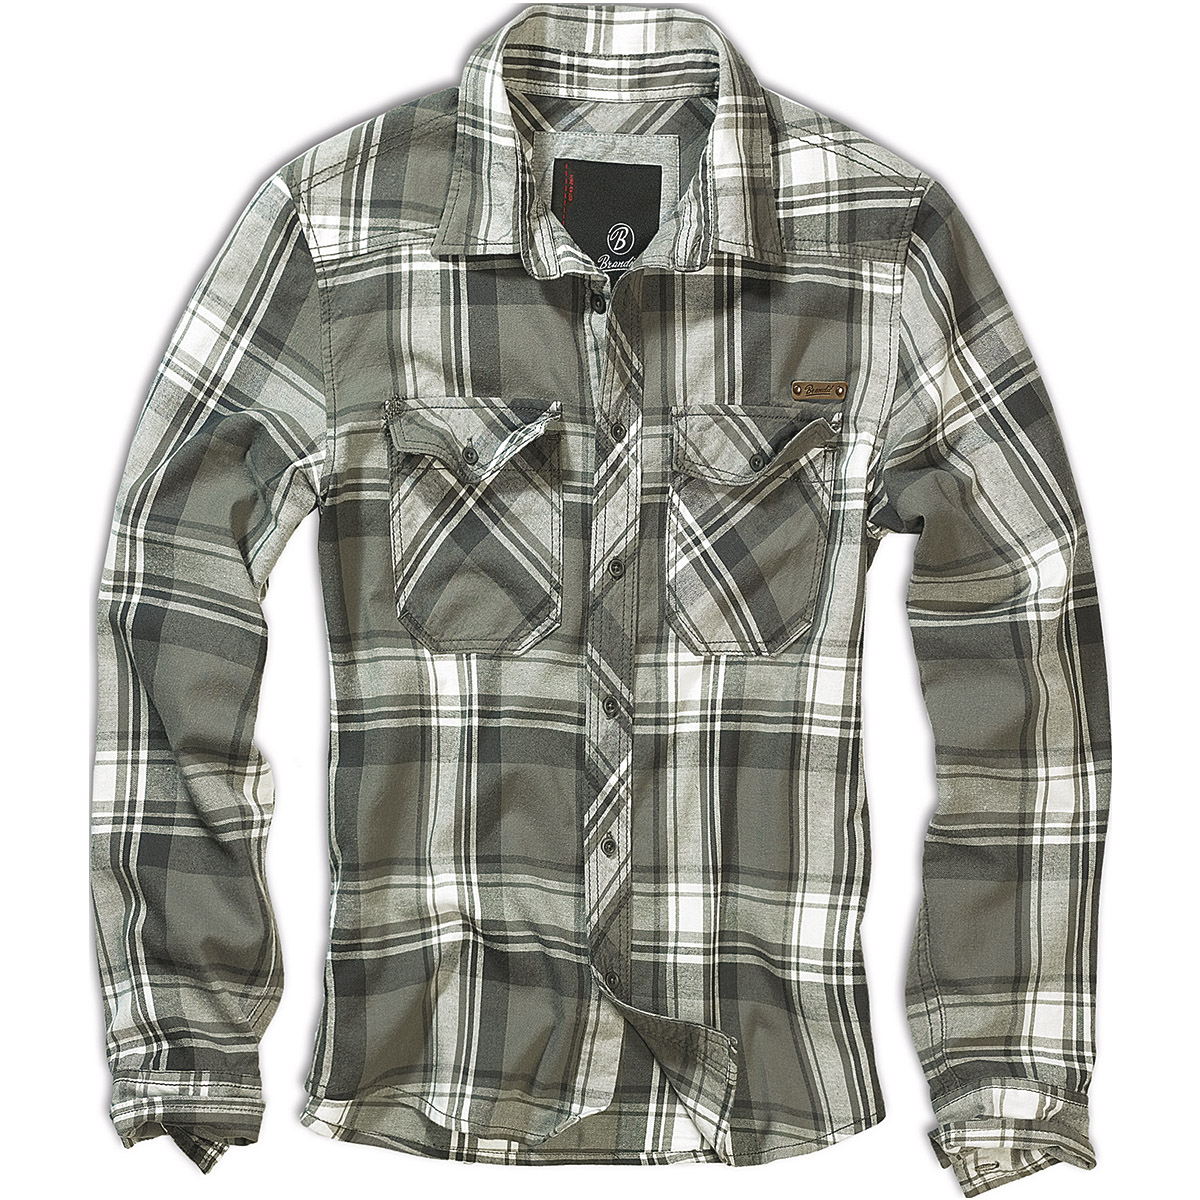 224d84135122 Brandit Casual Check Shirt Herren Baumwoll-Arbeit Langarm ...